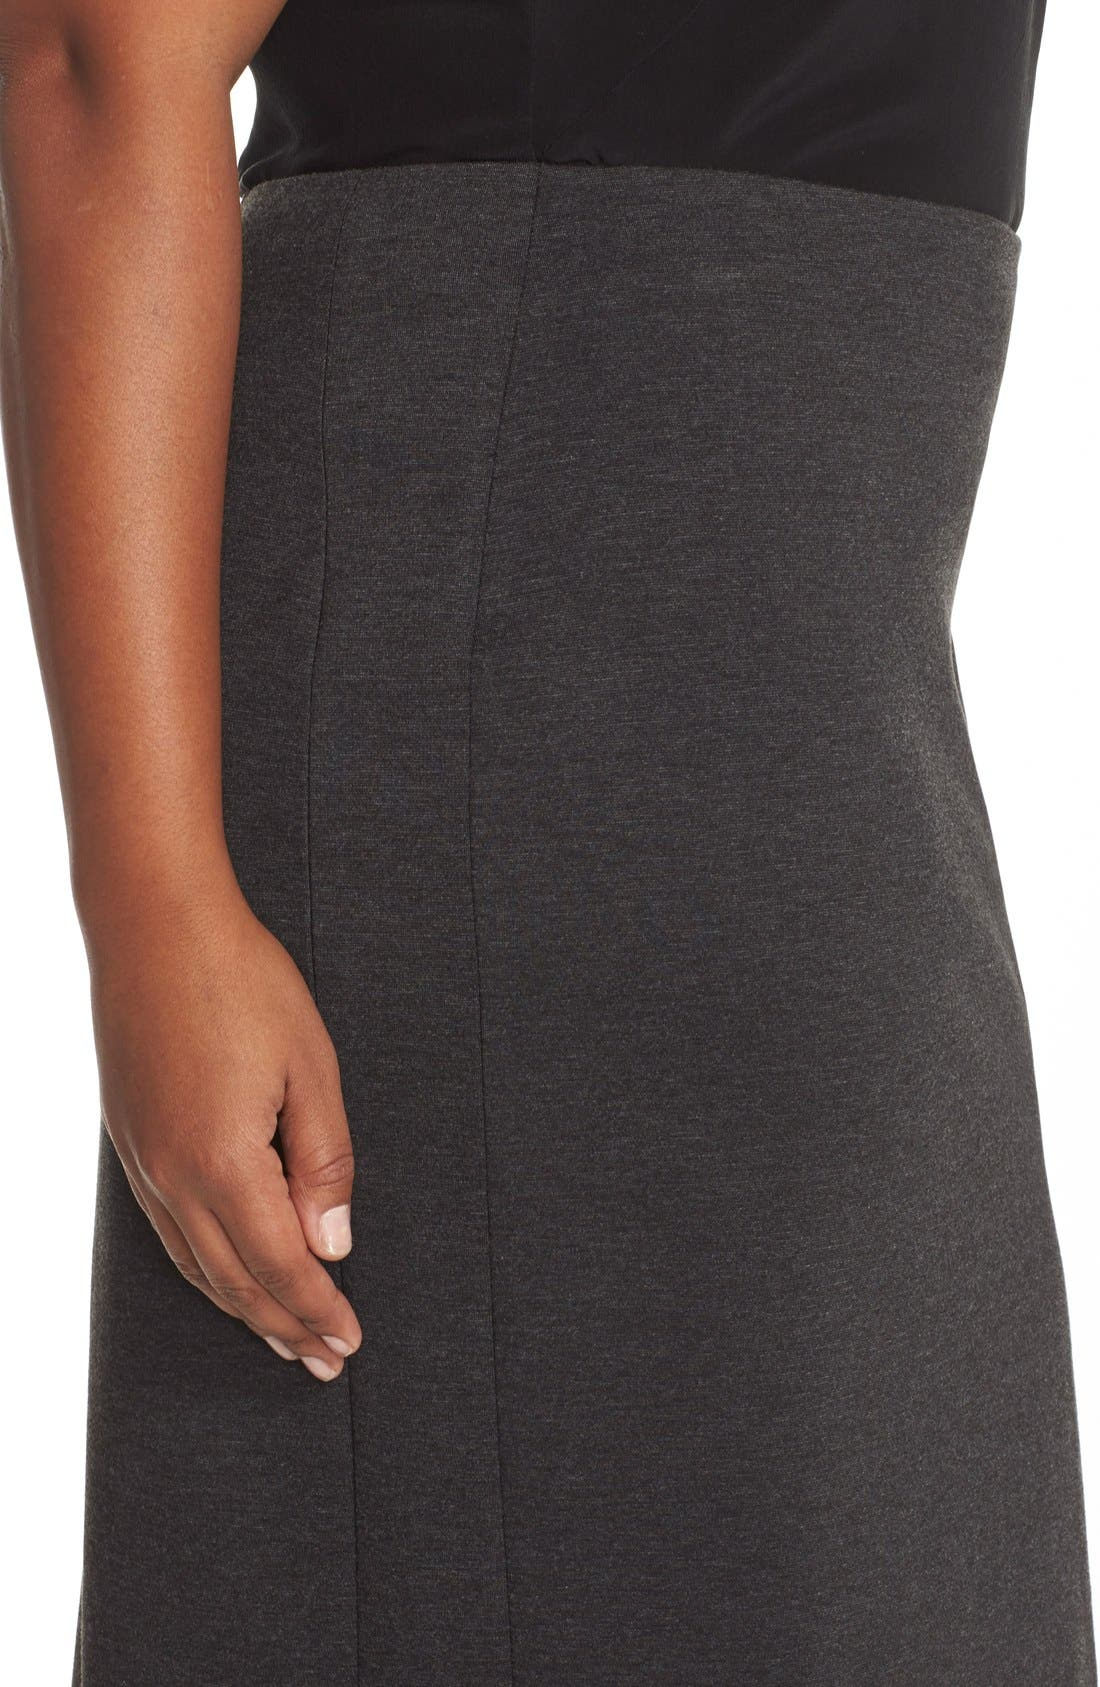 Alternate Image 4  - Vince Camuto Ponte Knit Skirt (Plus Size)